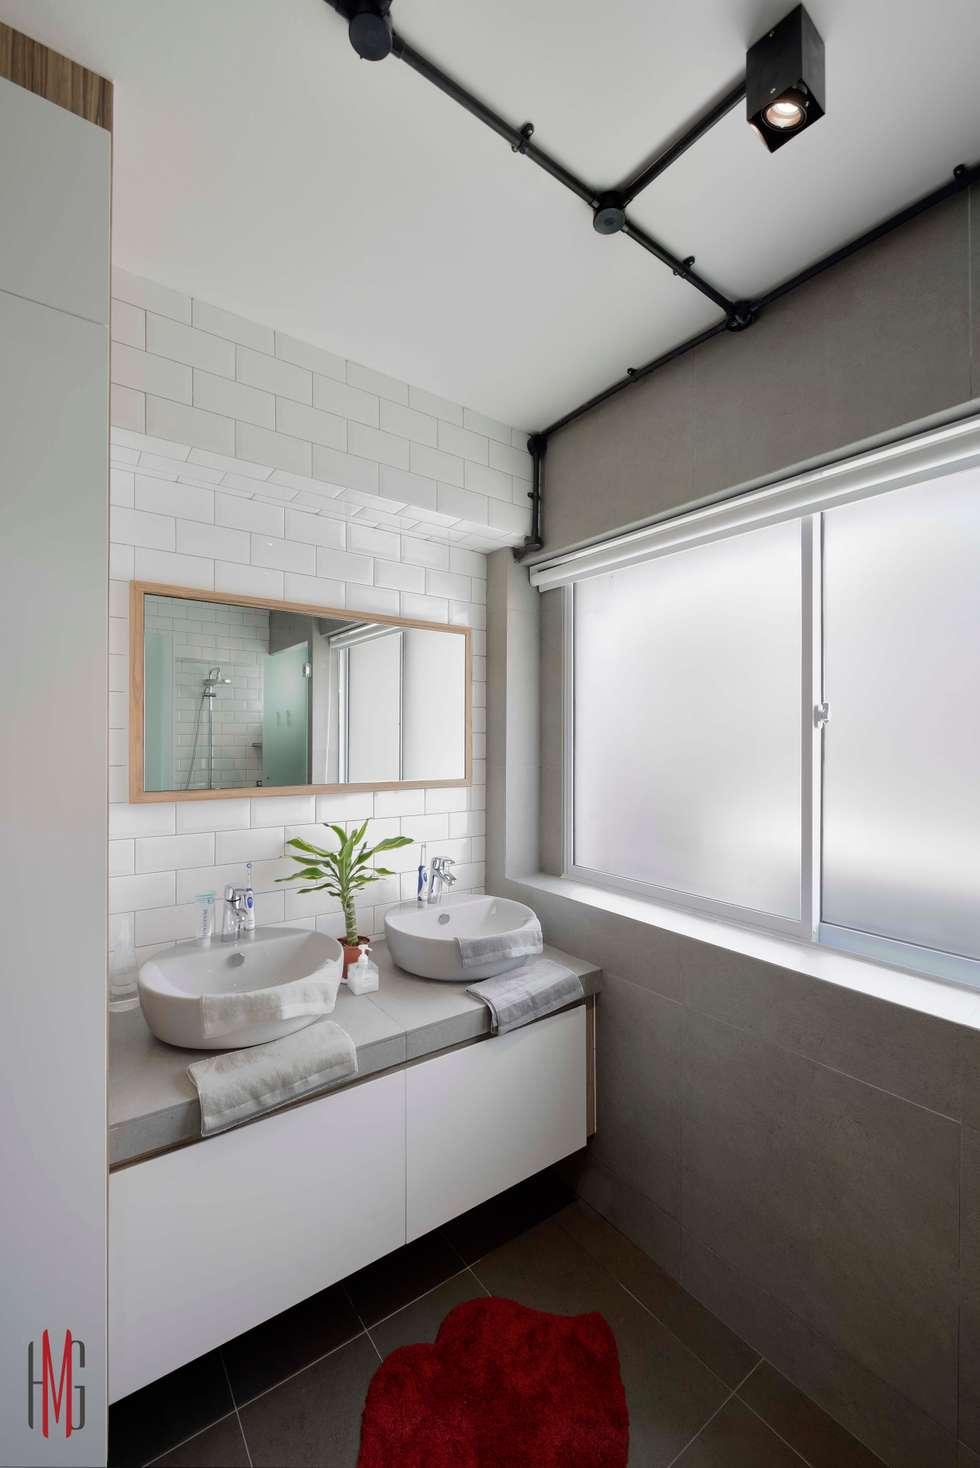 Studio Apartment Hdb modern bathroom photos: modern scandinavian hdb apartment | homify